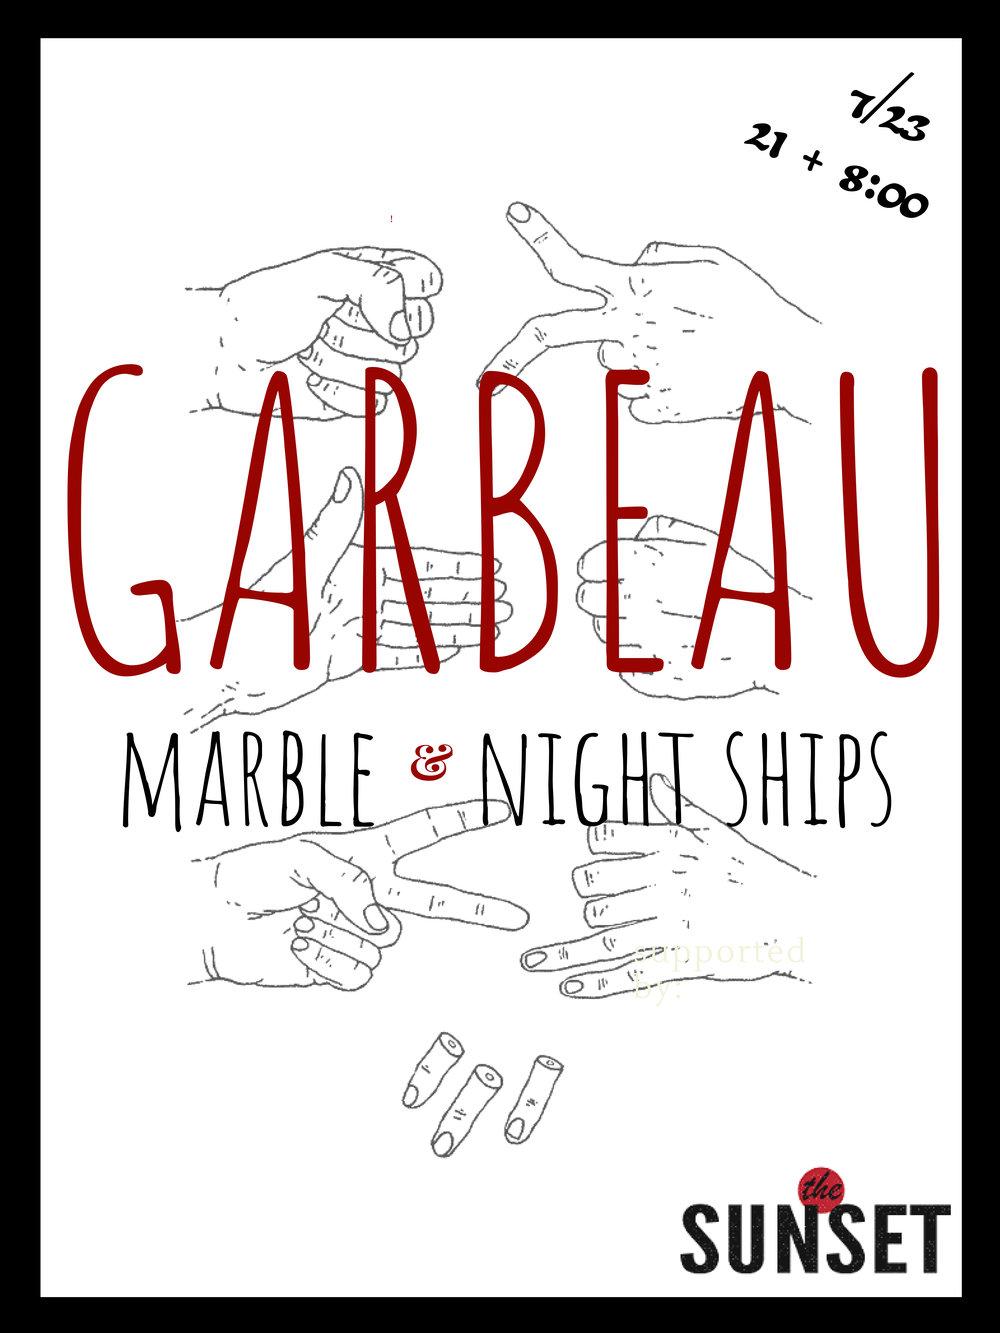 garbeau.album.release.thesunset.jpg